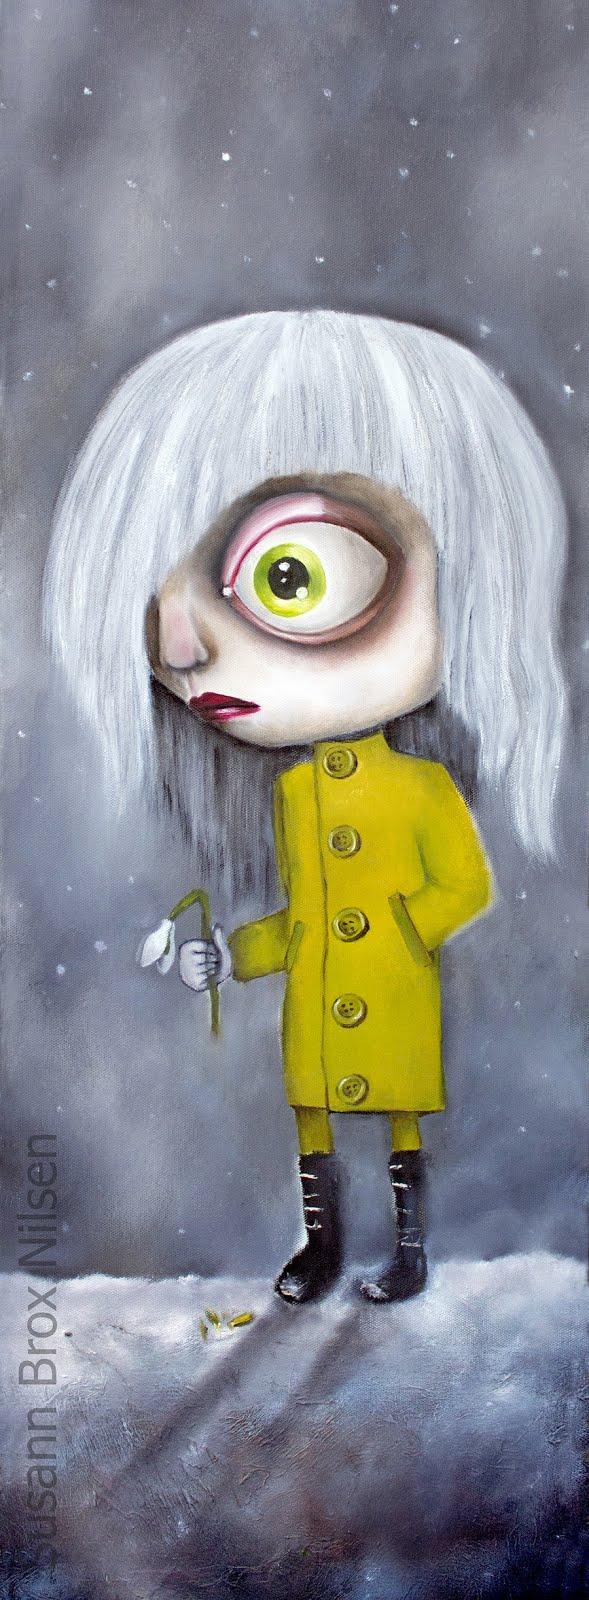 """Vinterpiken"", 2008"